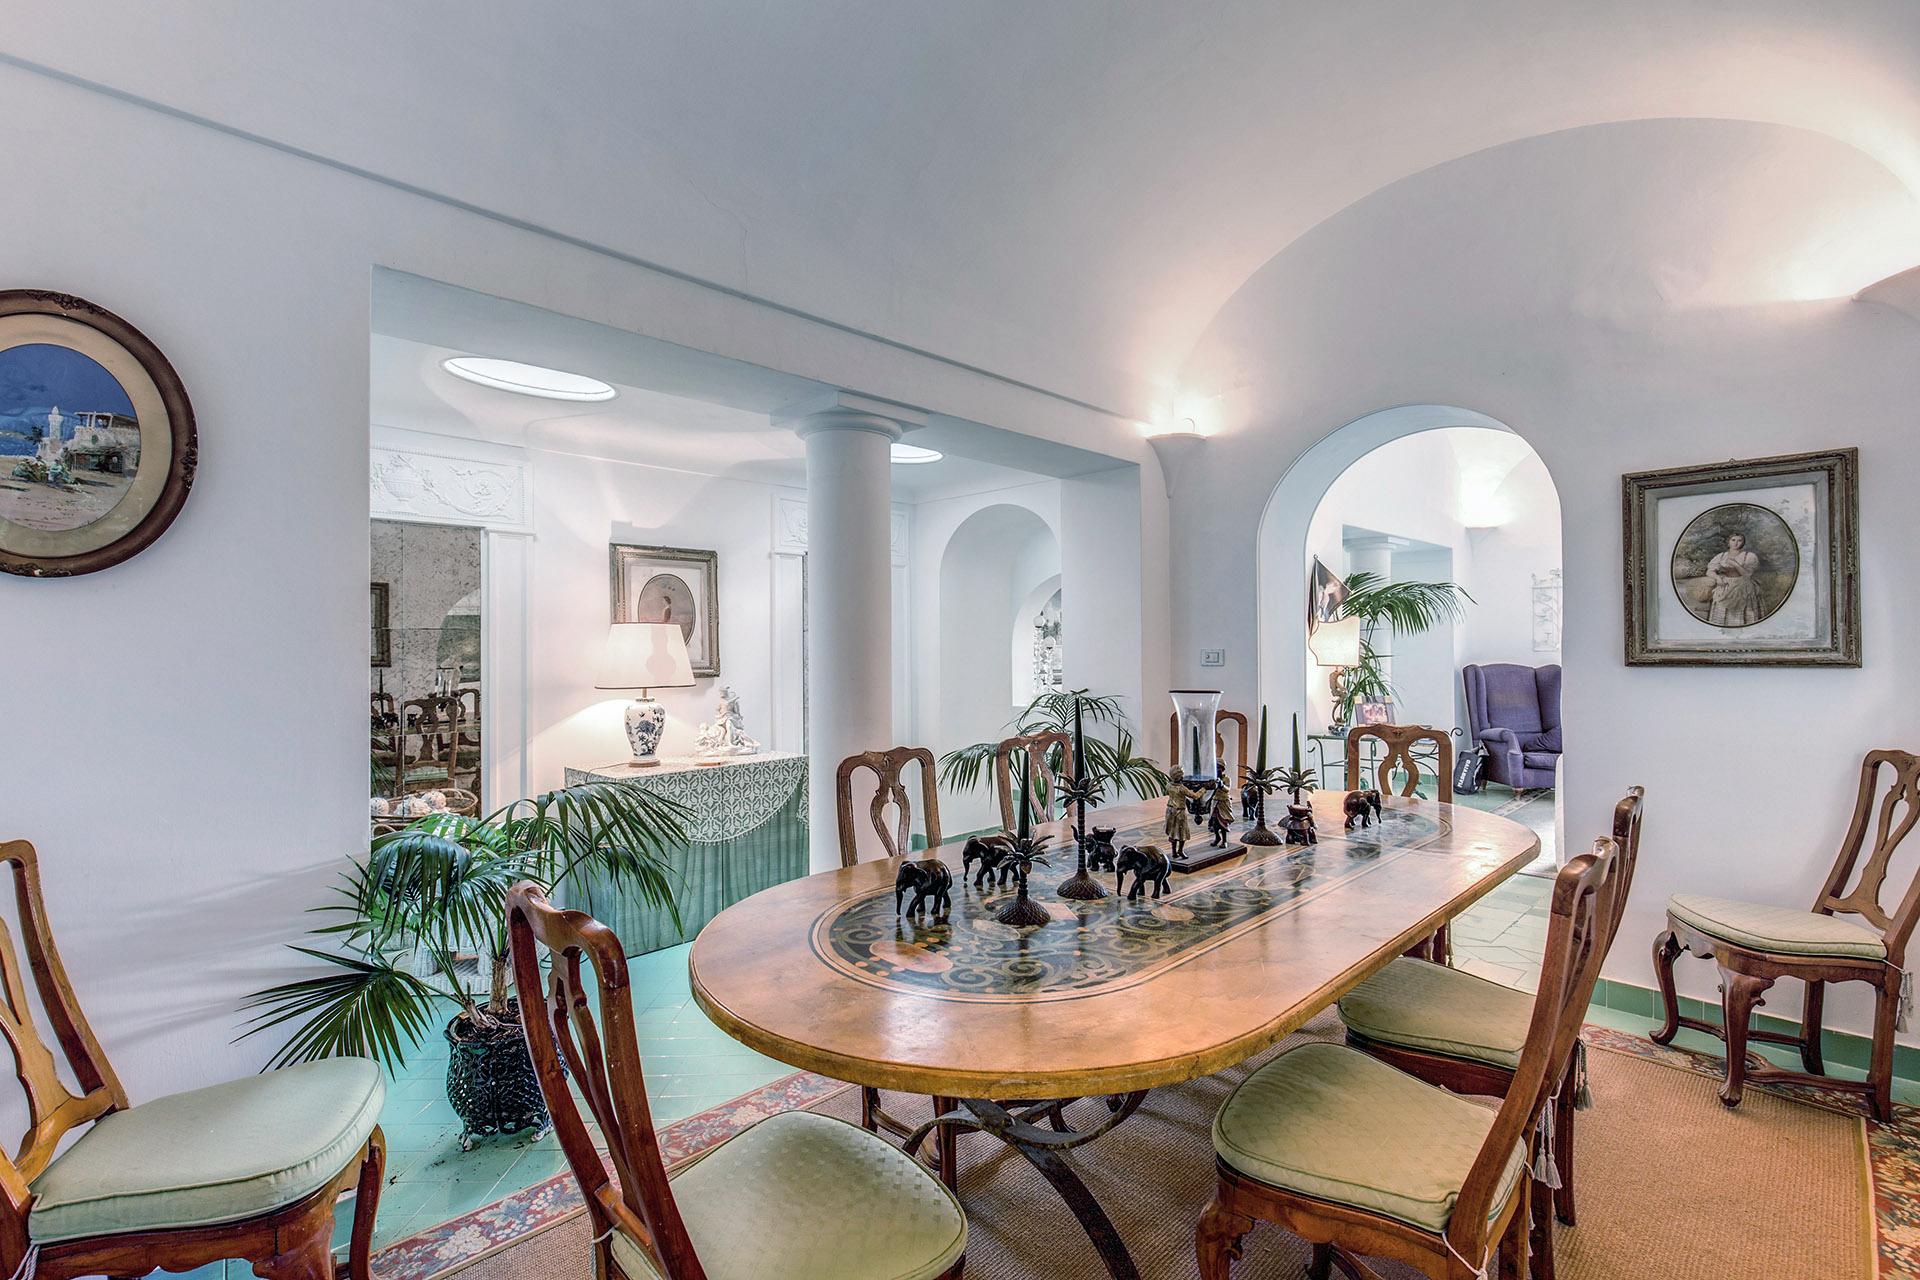 Apartment Green Coral -  Luxury 1950 s Villa photo 18375134